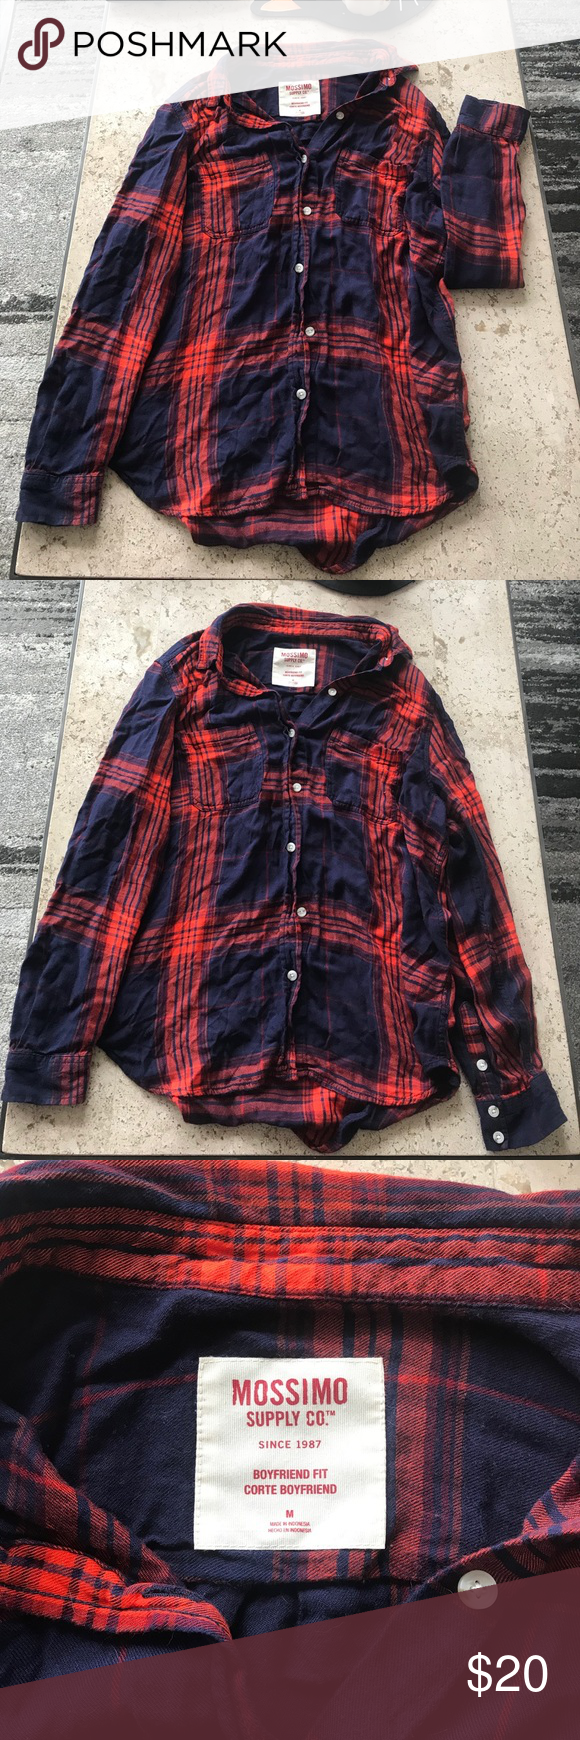 Red flannel 2018  Womenus plaid flannel shirt size medium in   My Posh Picks